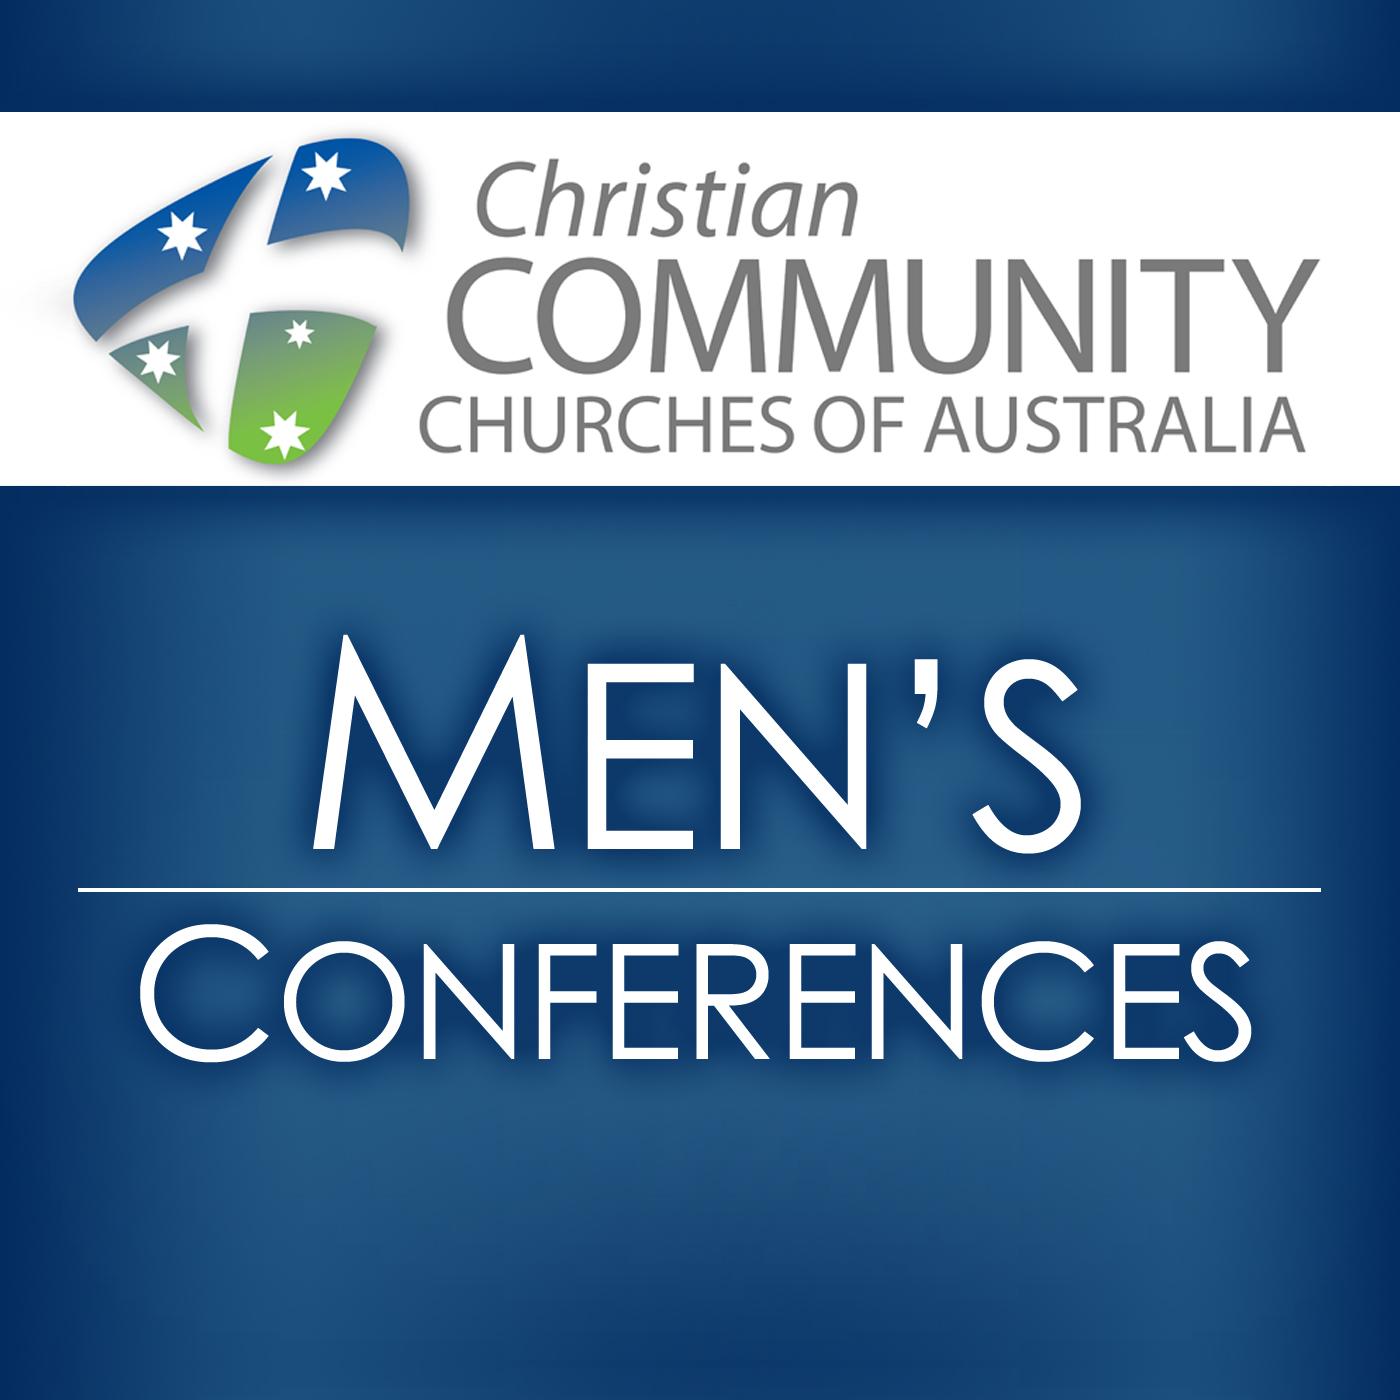 Men's Conference - CCCA